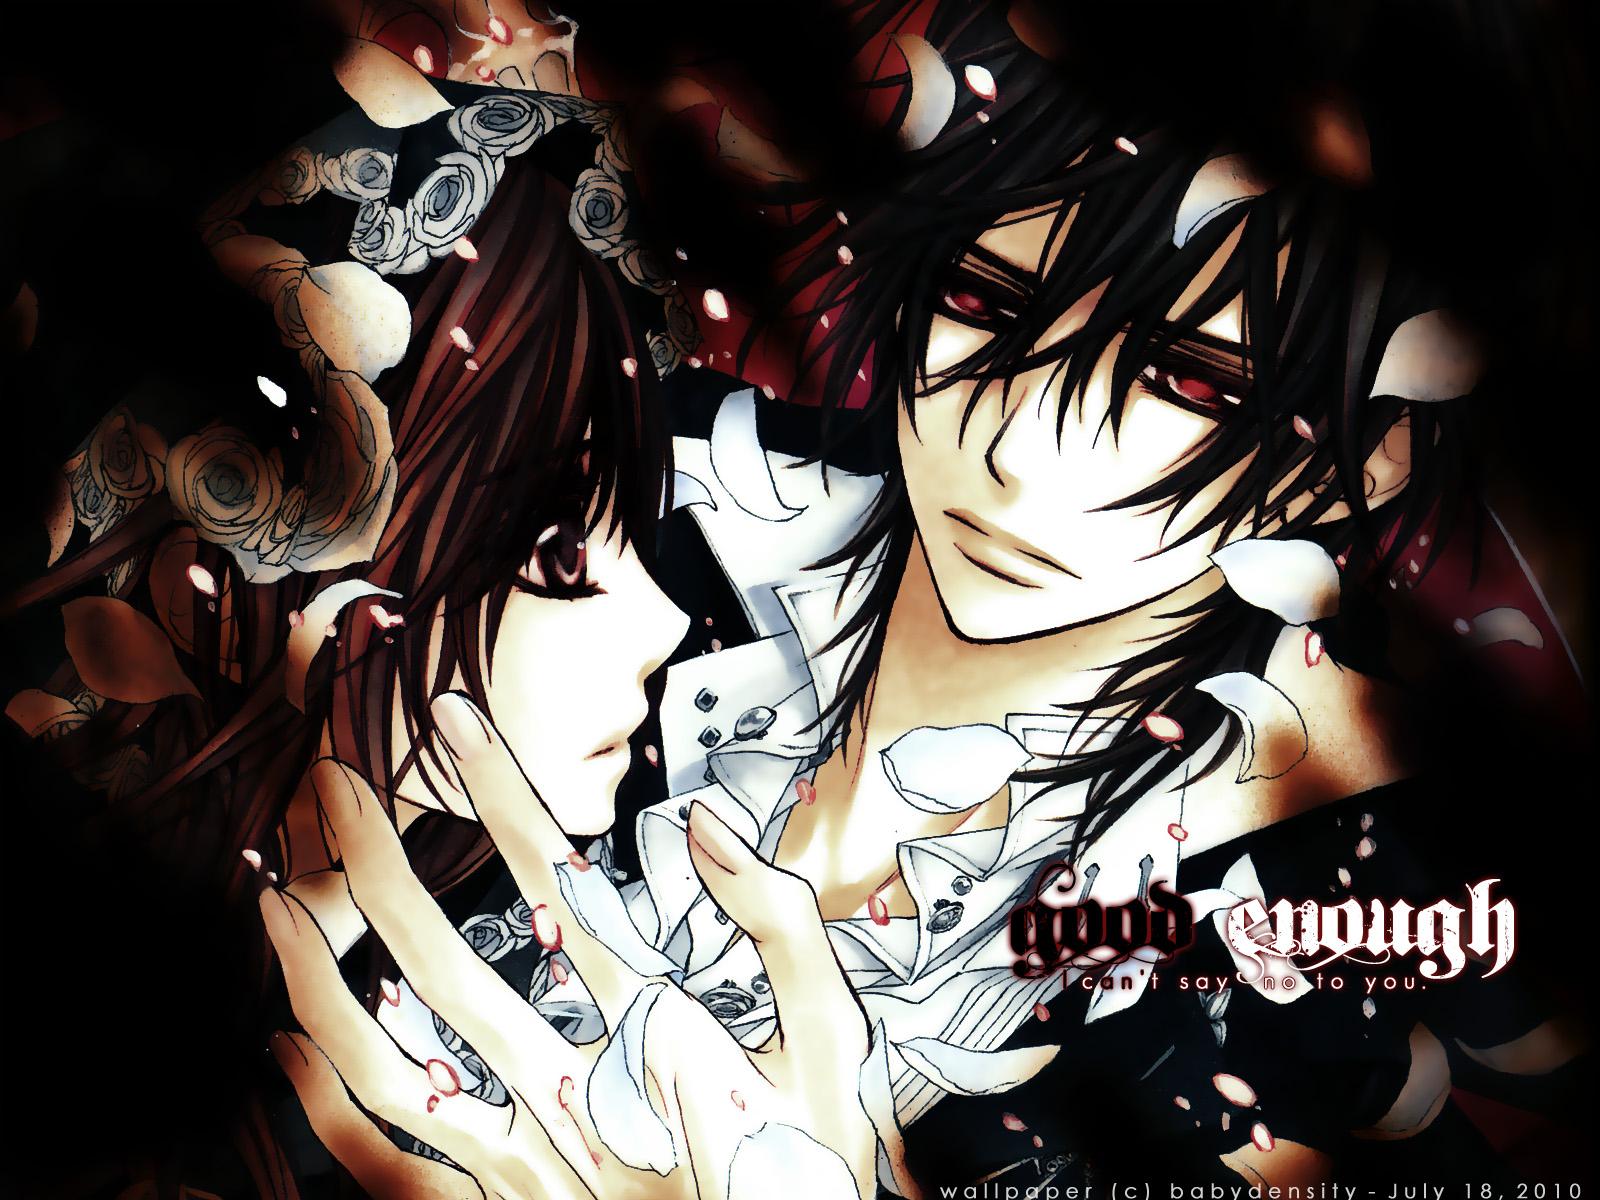 Kaname and yuuki kaname and yuuki kuran vk wallpaper - Vampire knight anime wallpaper ...